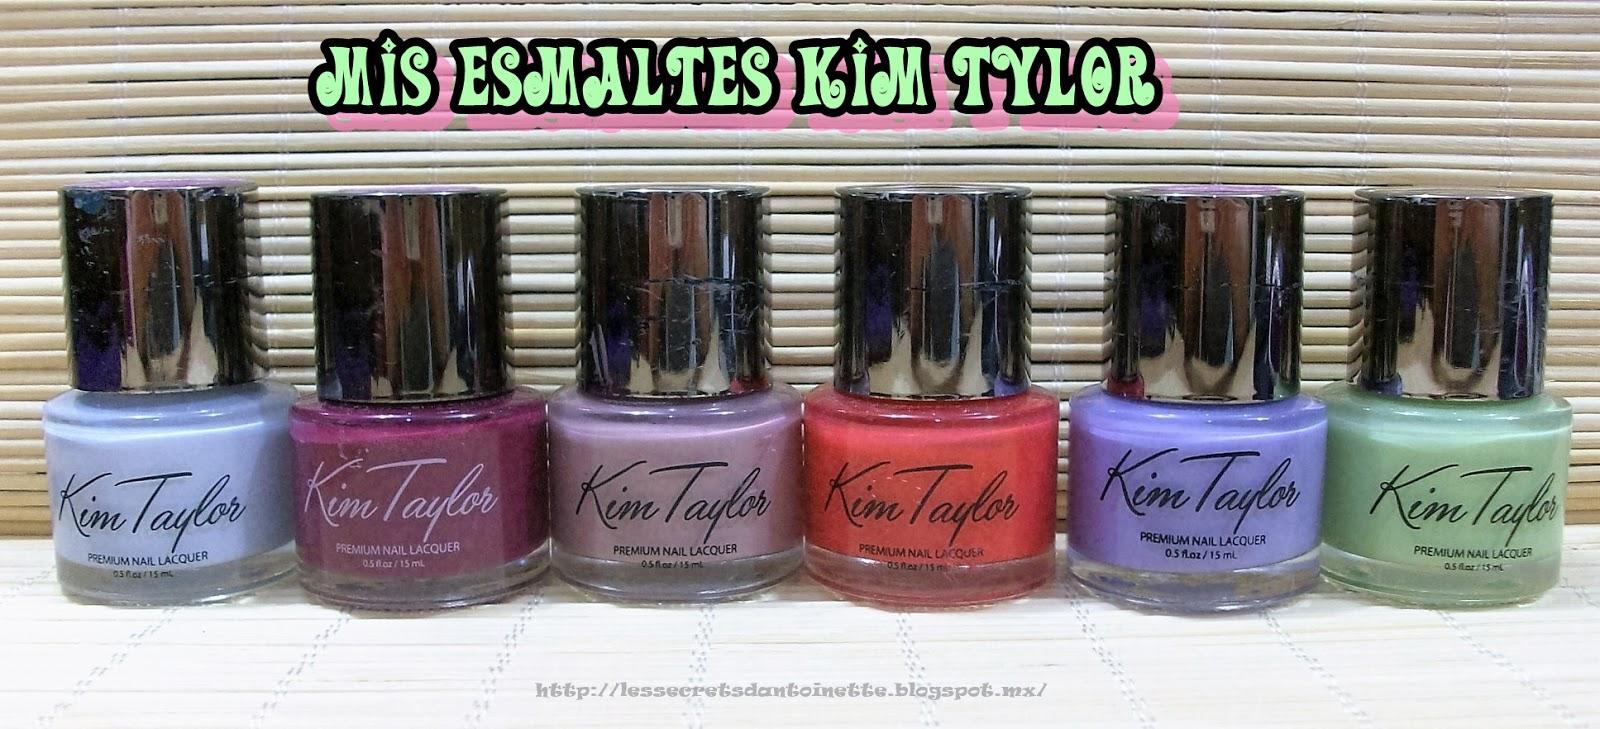 Les secrets d\' Antoinette: Esmaltes para uñas Kim Tylor ♥ mini ...